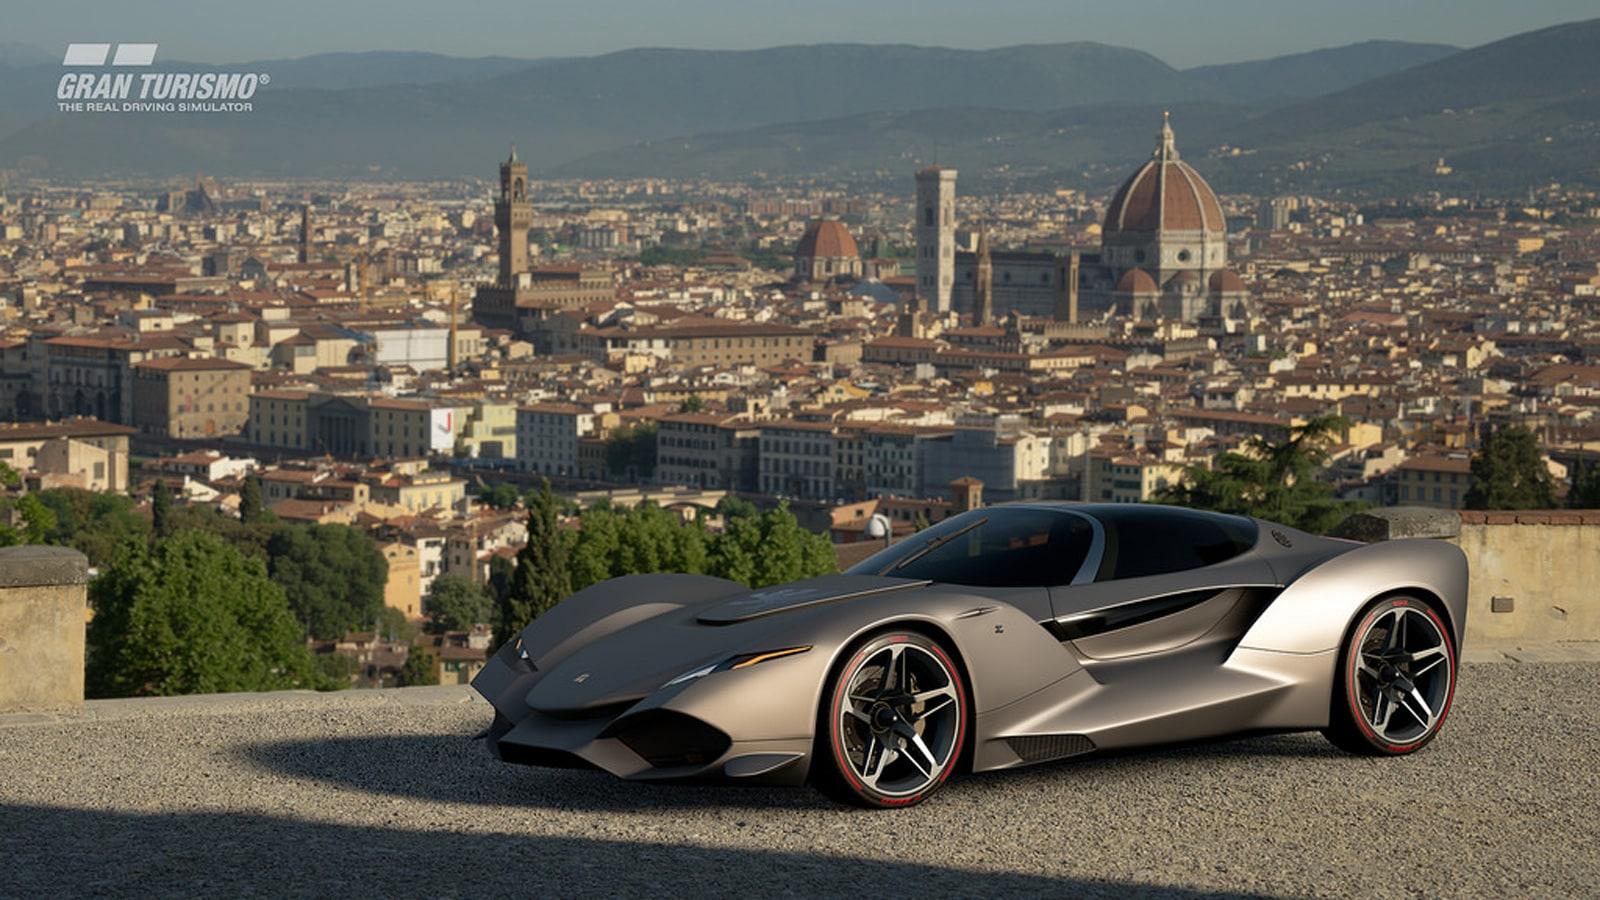 Gran Turismo Sport\' brings back a classic solo racing mode